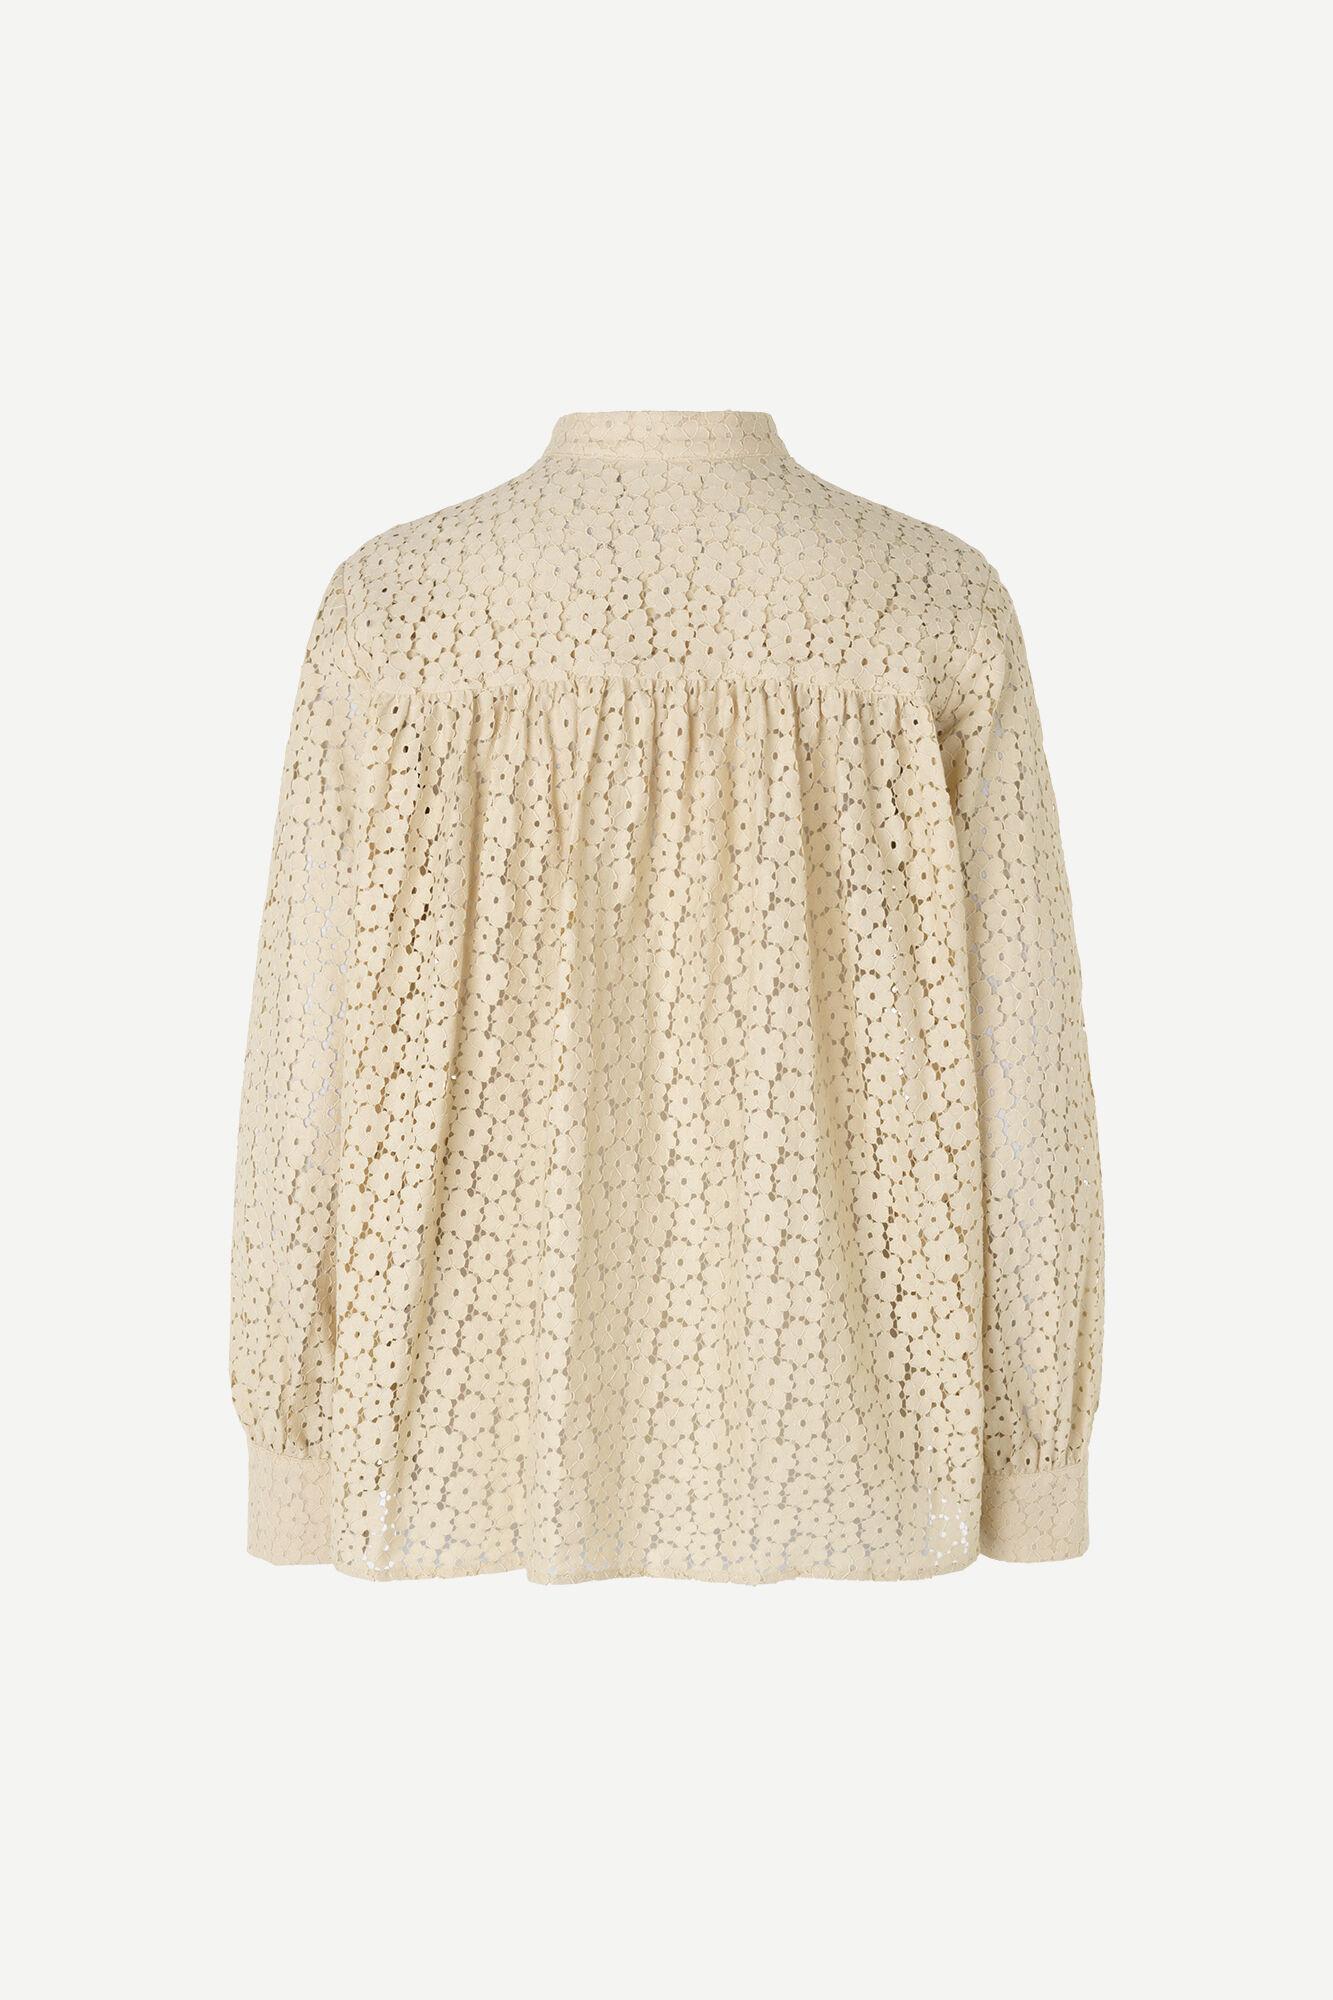 Kiana shirt 14011, BROWN RICE